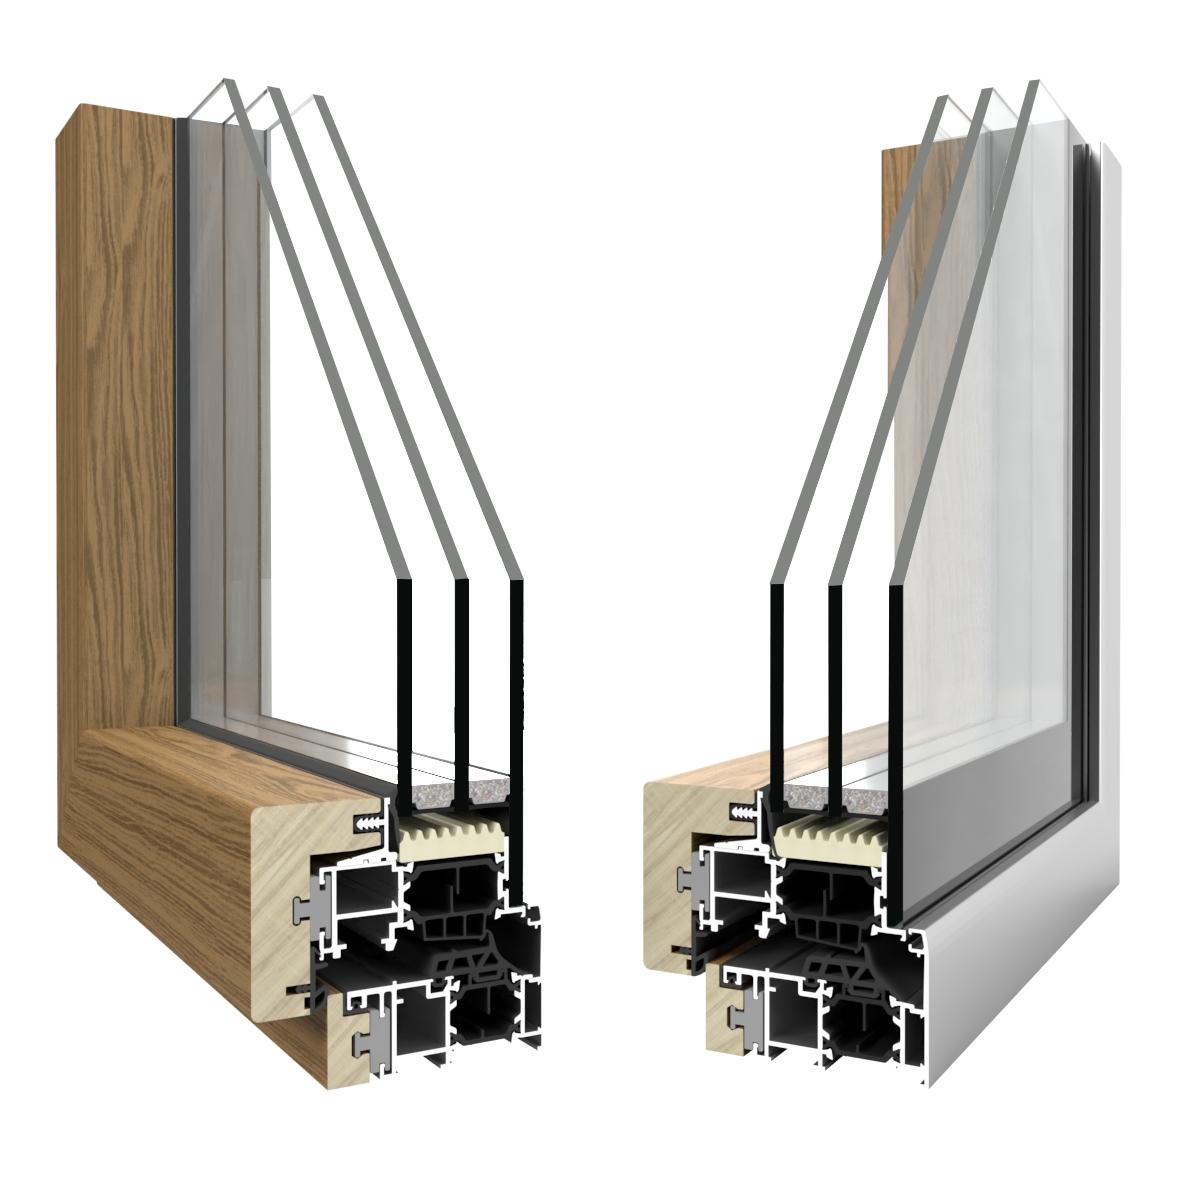 https://www.allpaint.it/wp-content/uploads/2021/07/finestre-alluminio-legno-tkwood-light-allpaint.jpg